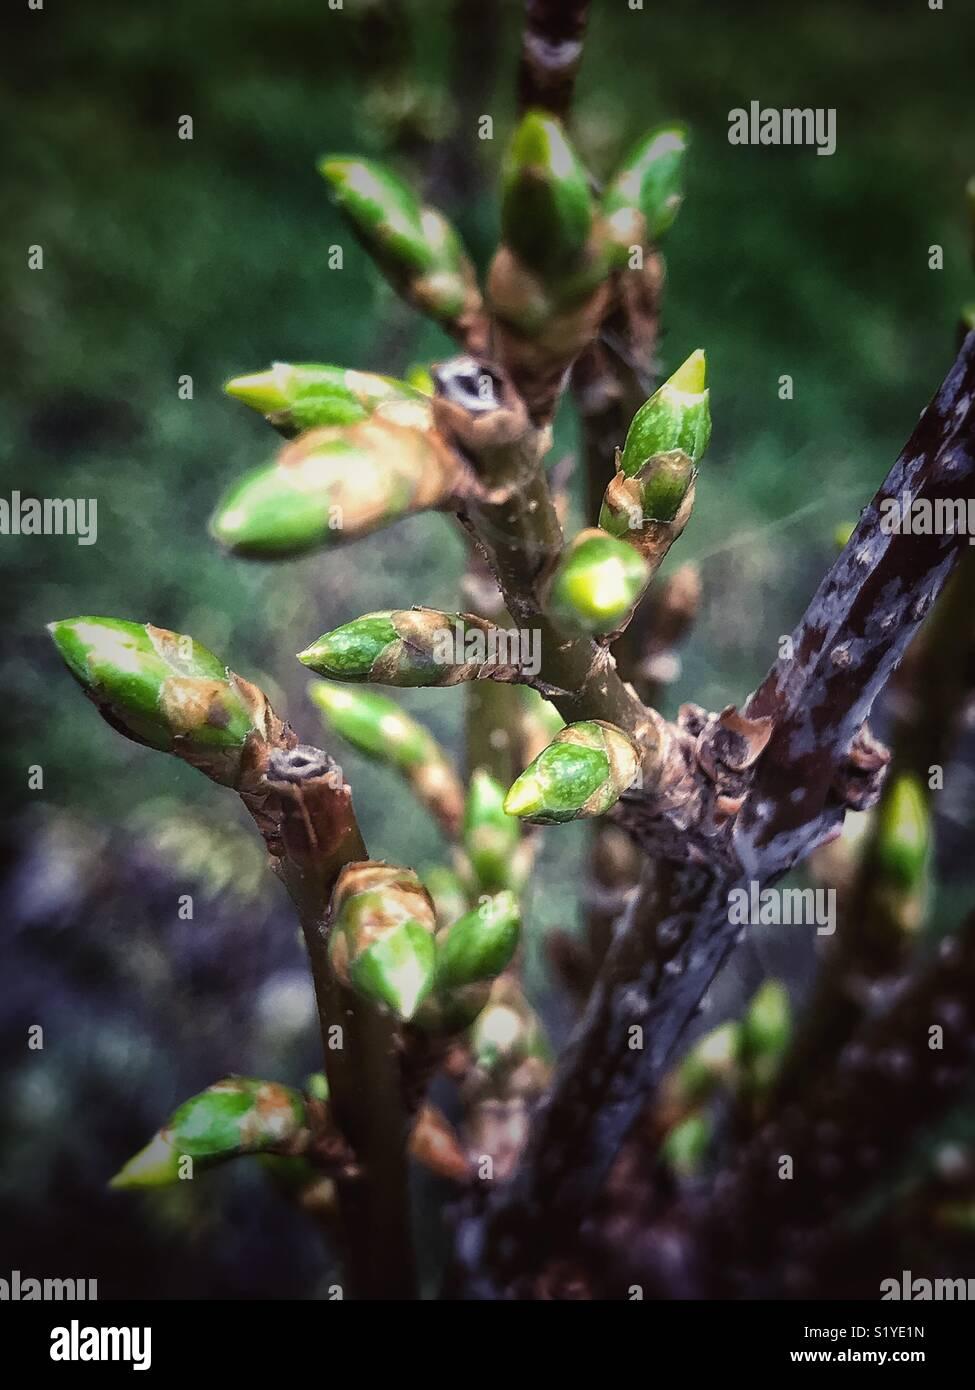 bursting buds - Stock Image